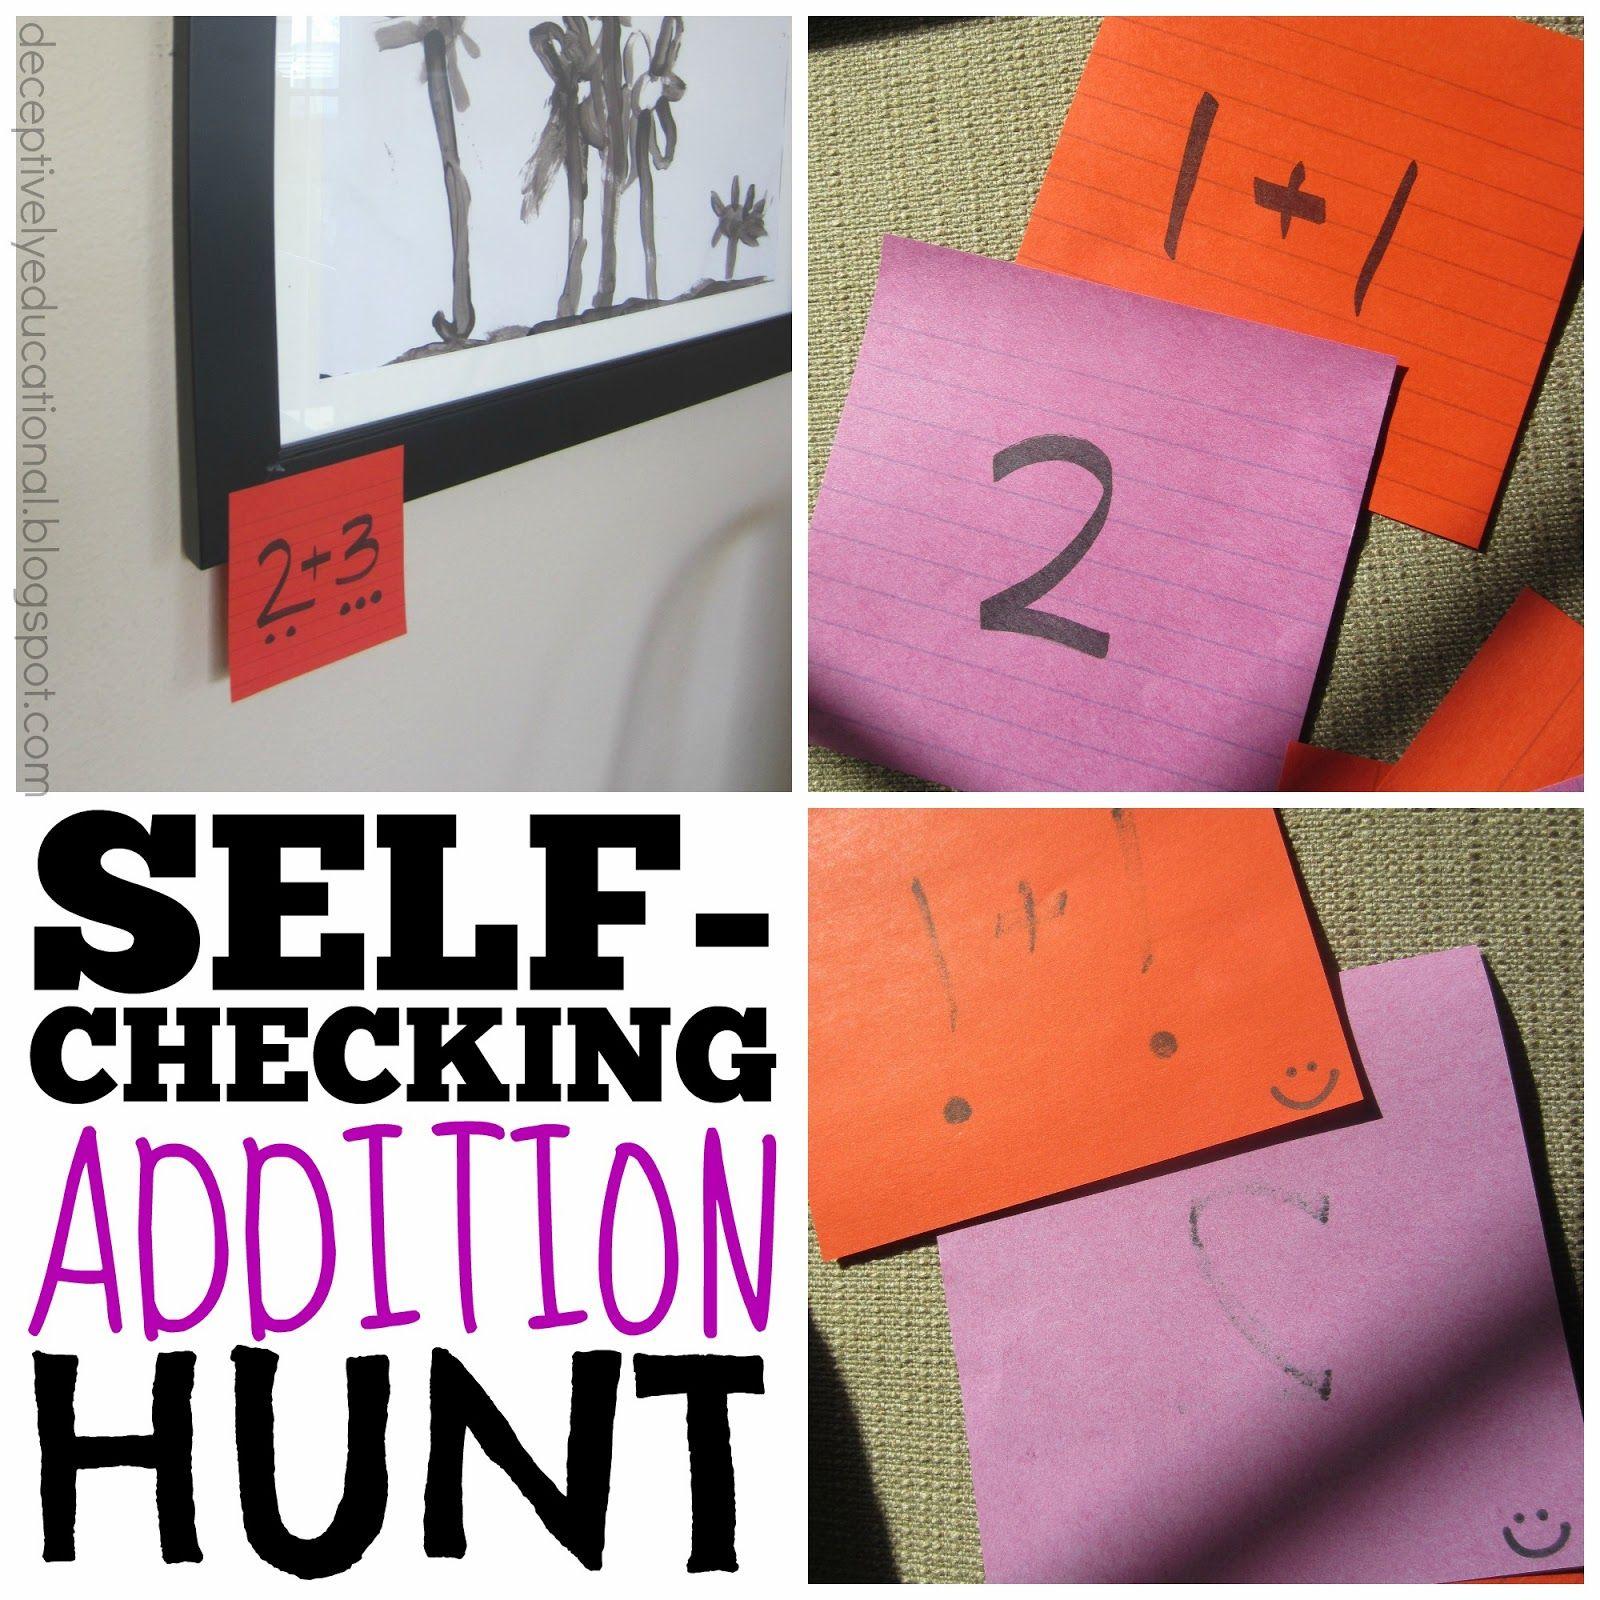 Self Checking Addition Hunt